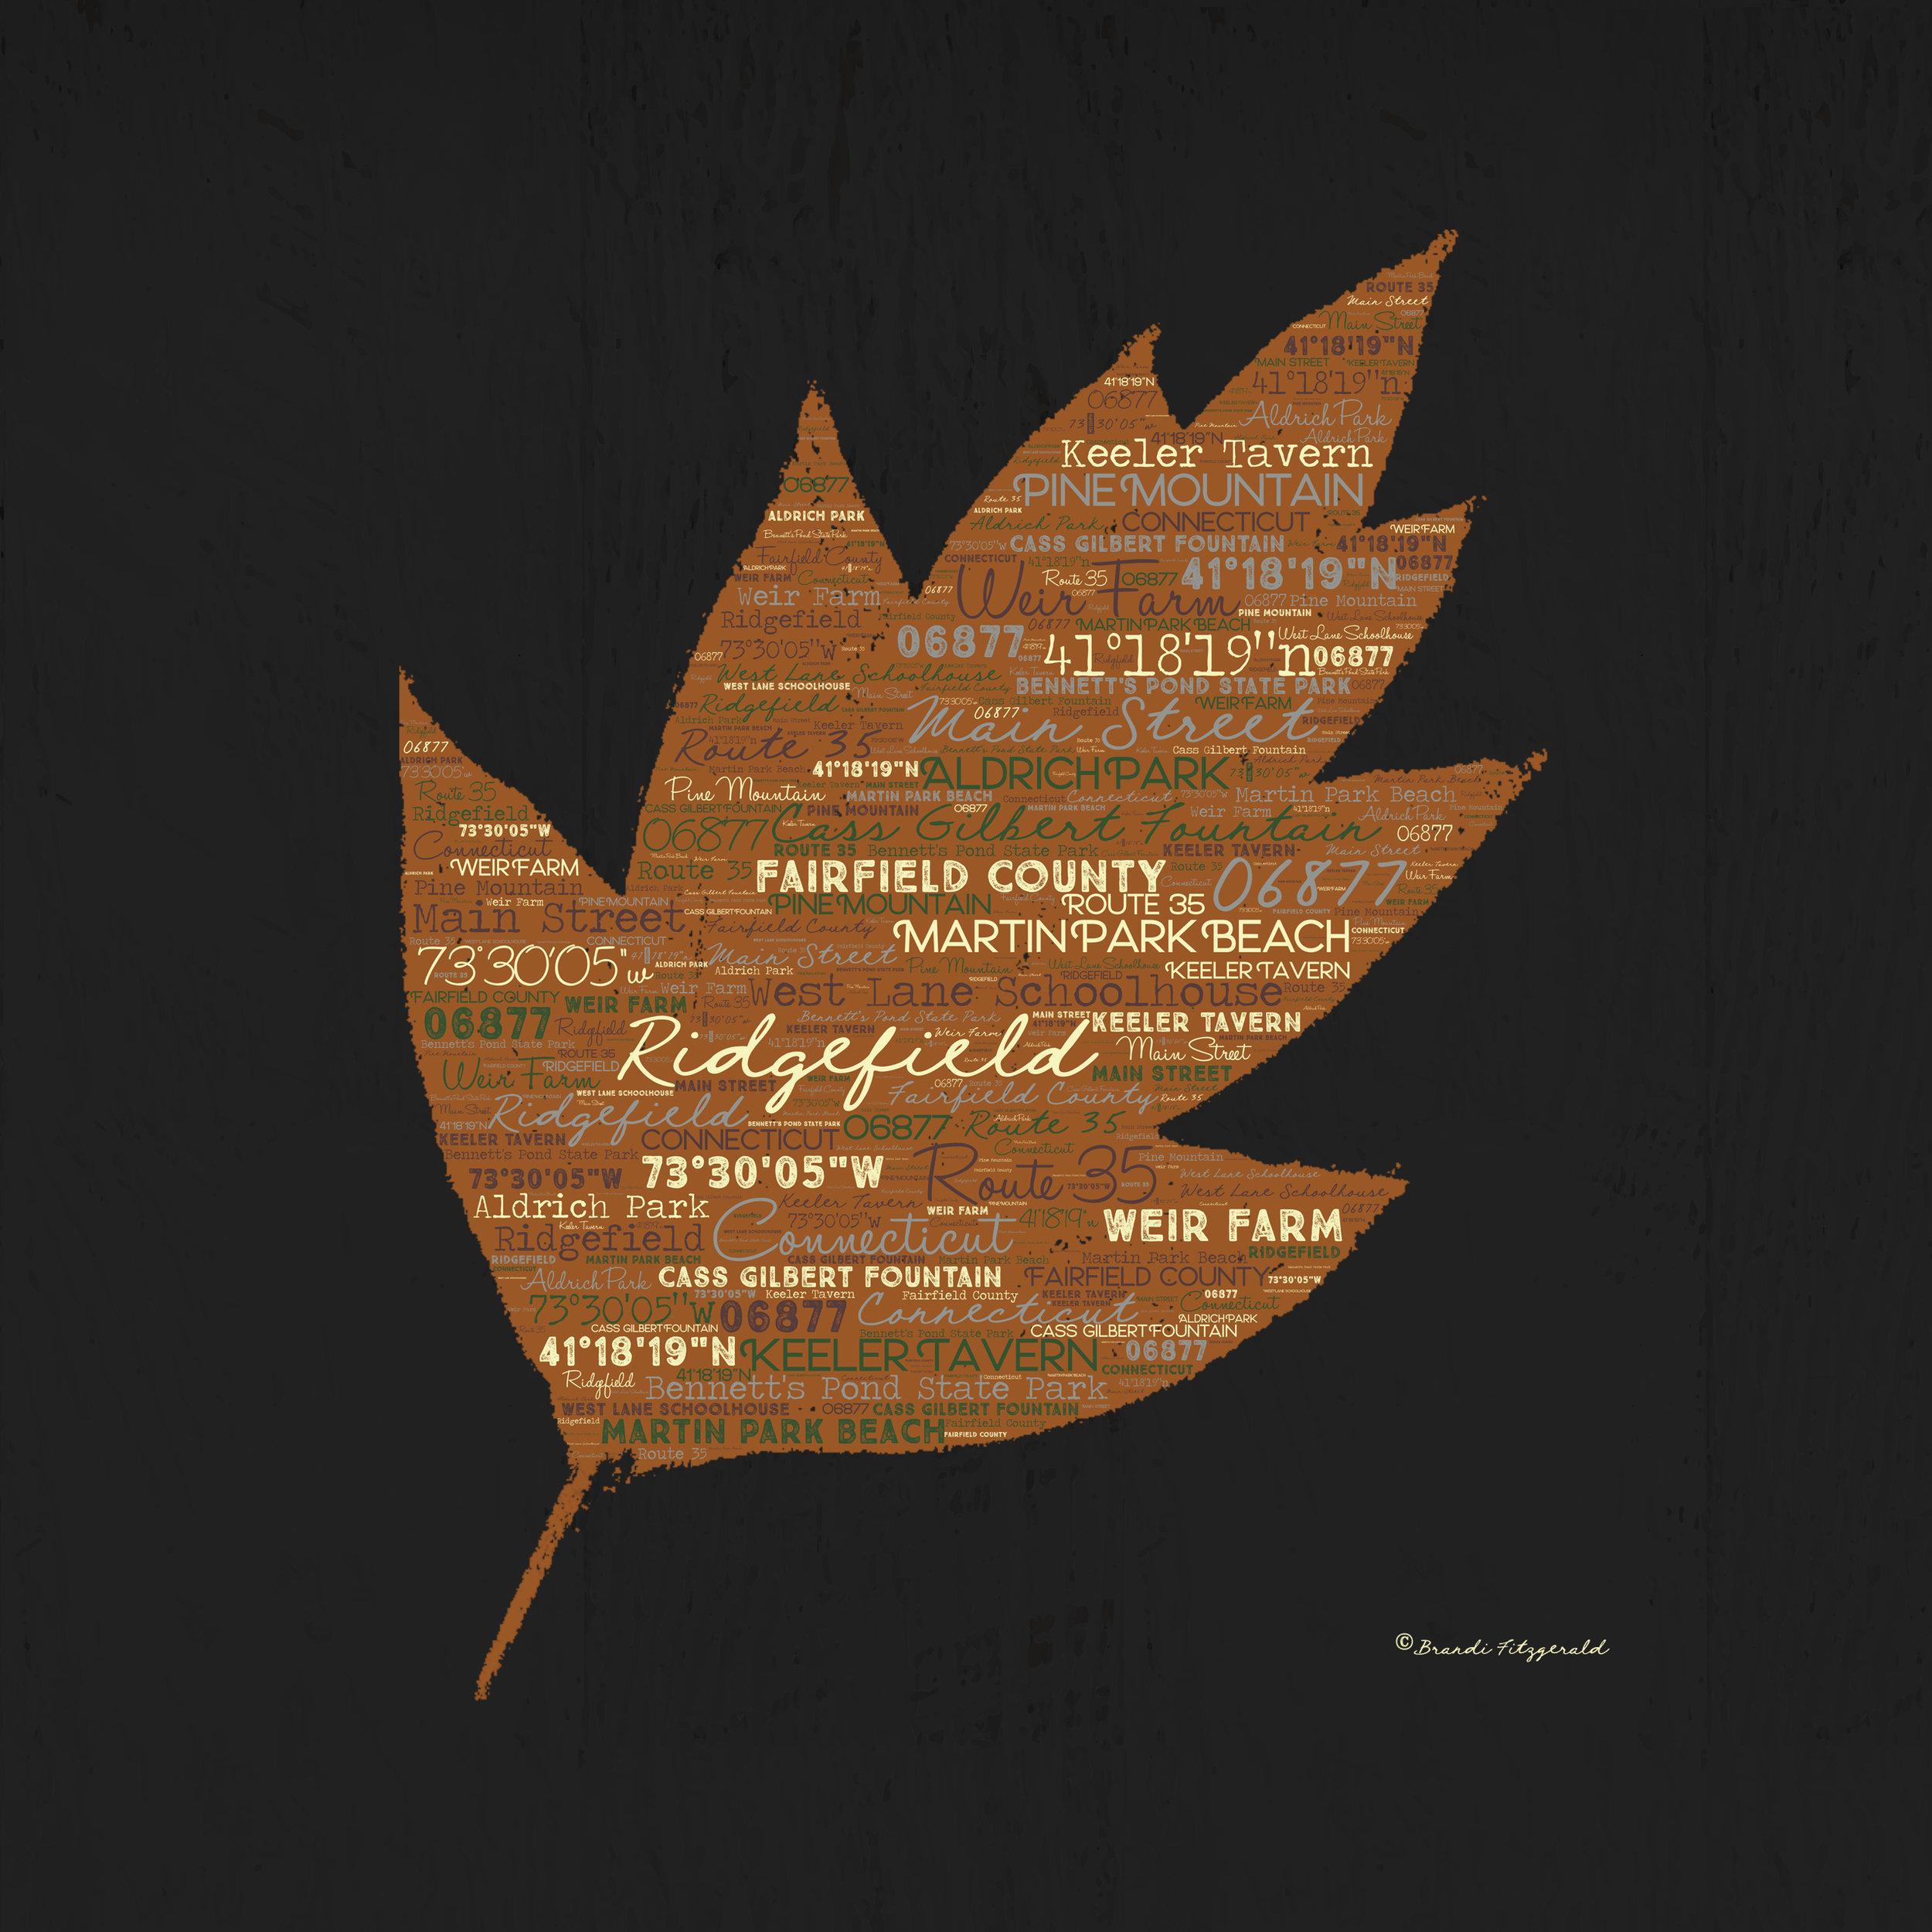 ABS_Ridgefield_Leaf.jpg